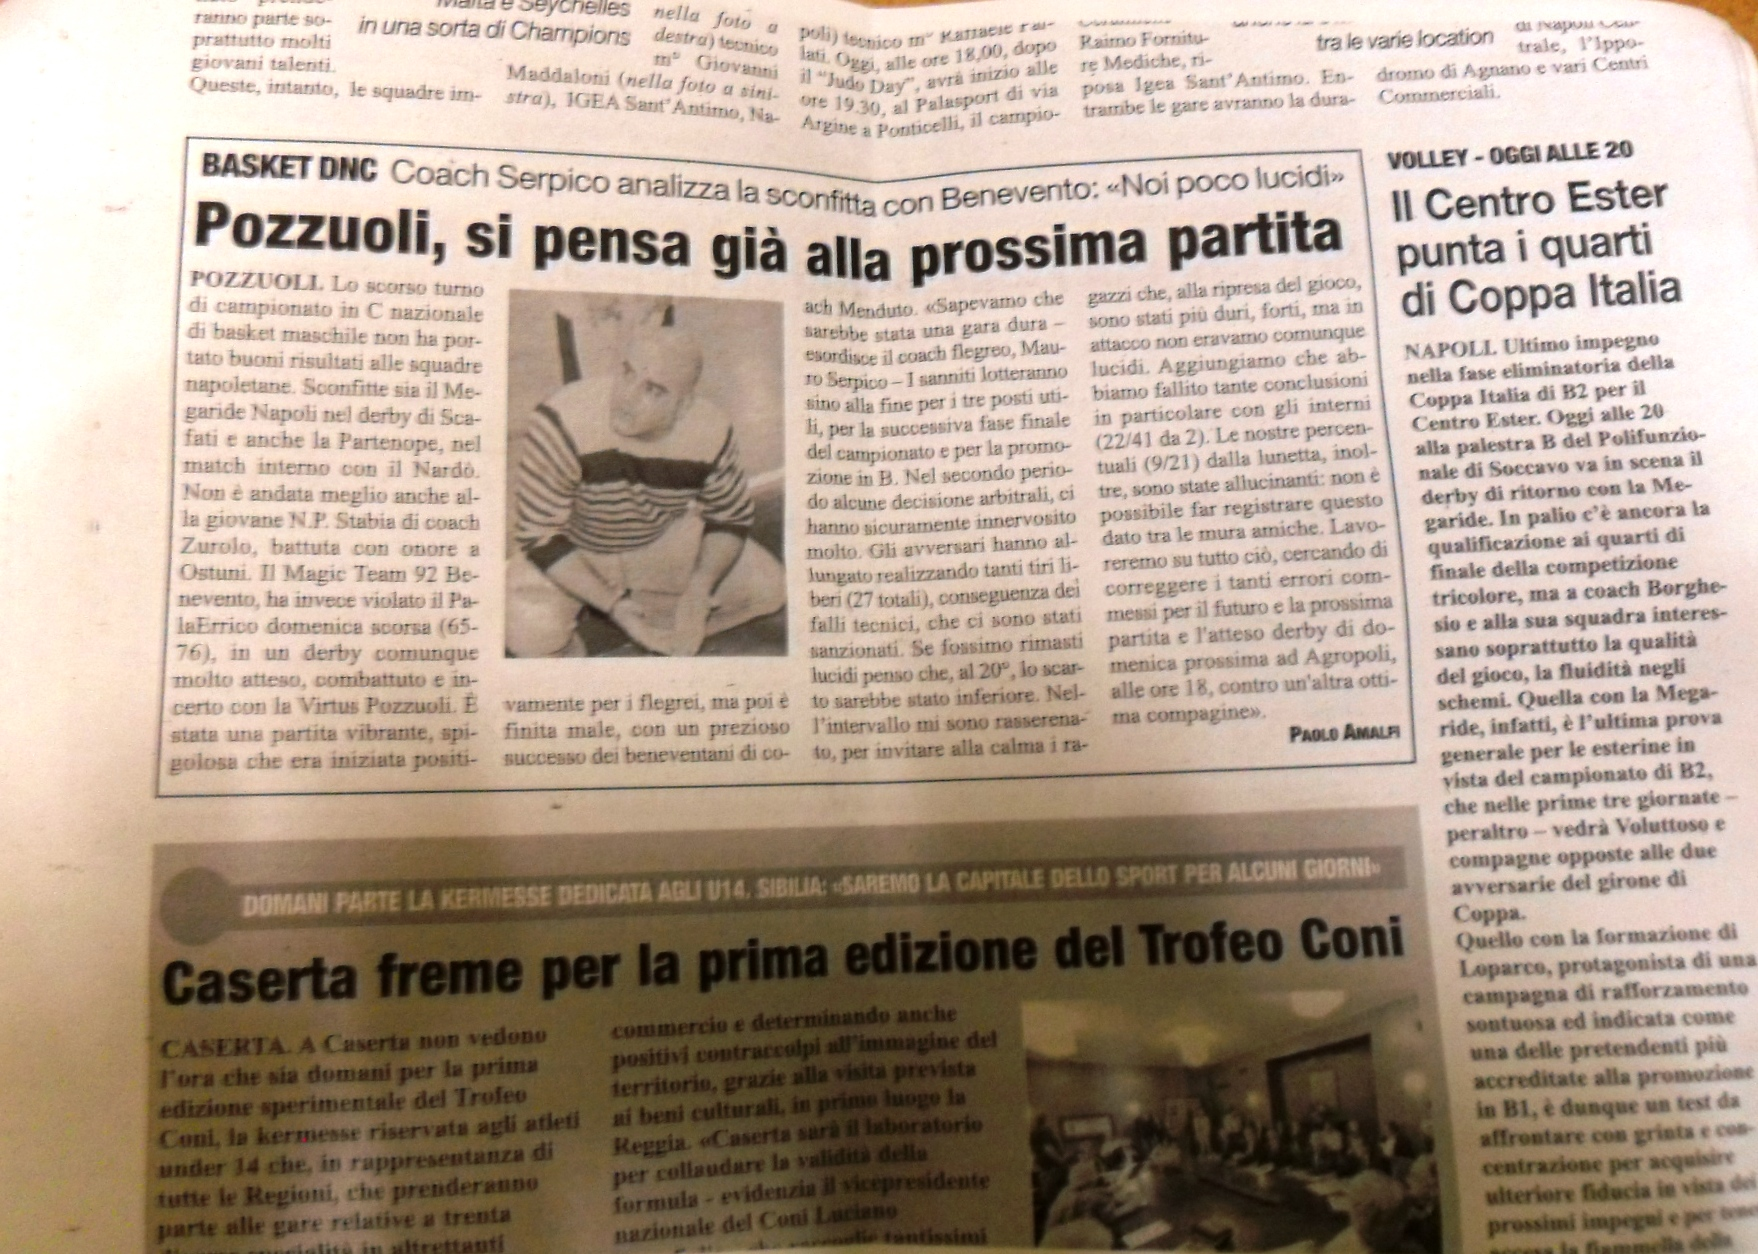 ROMA - 8 ottobre 2014